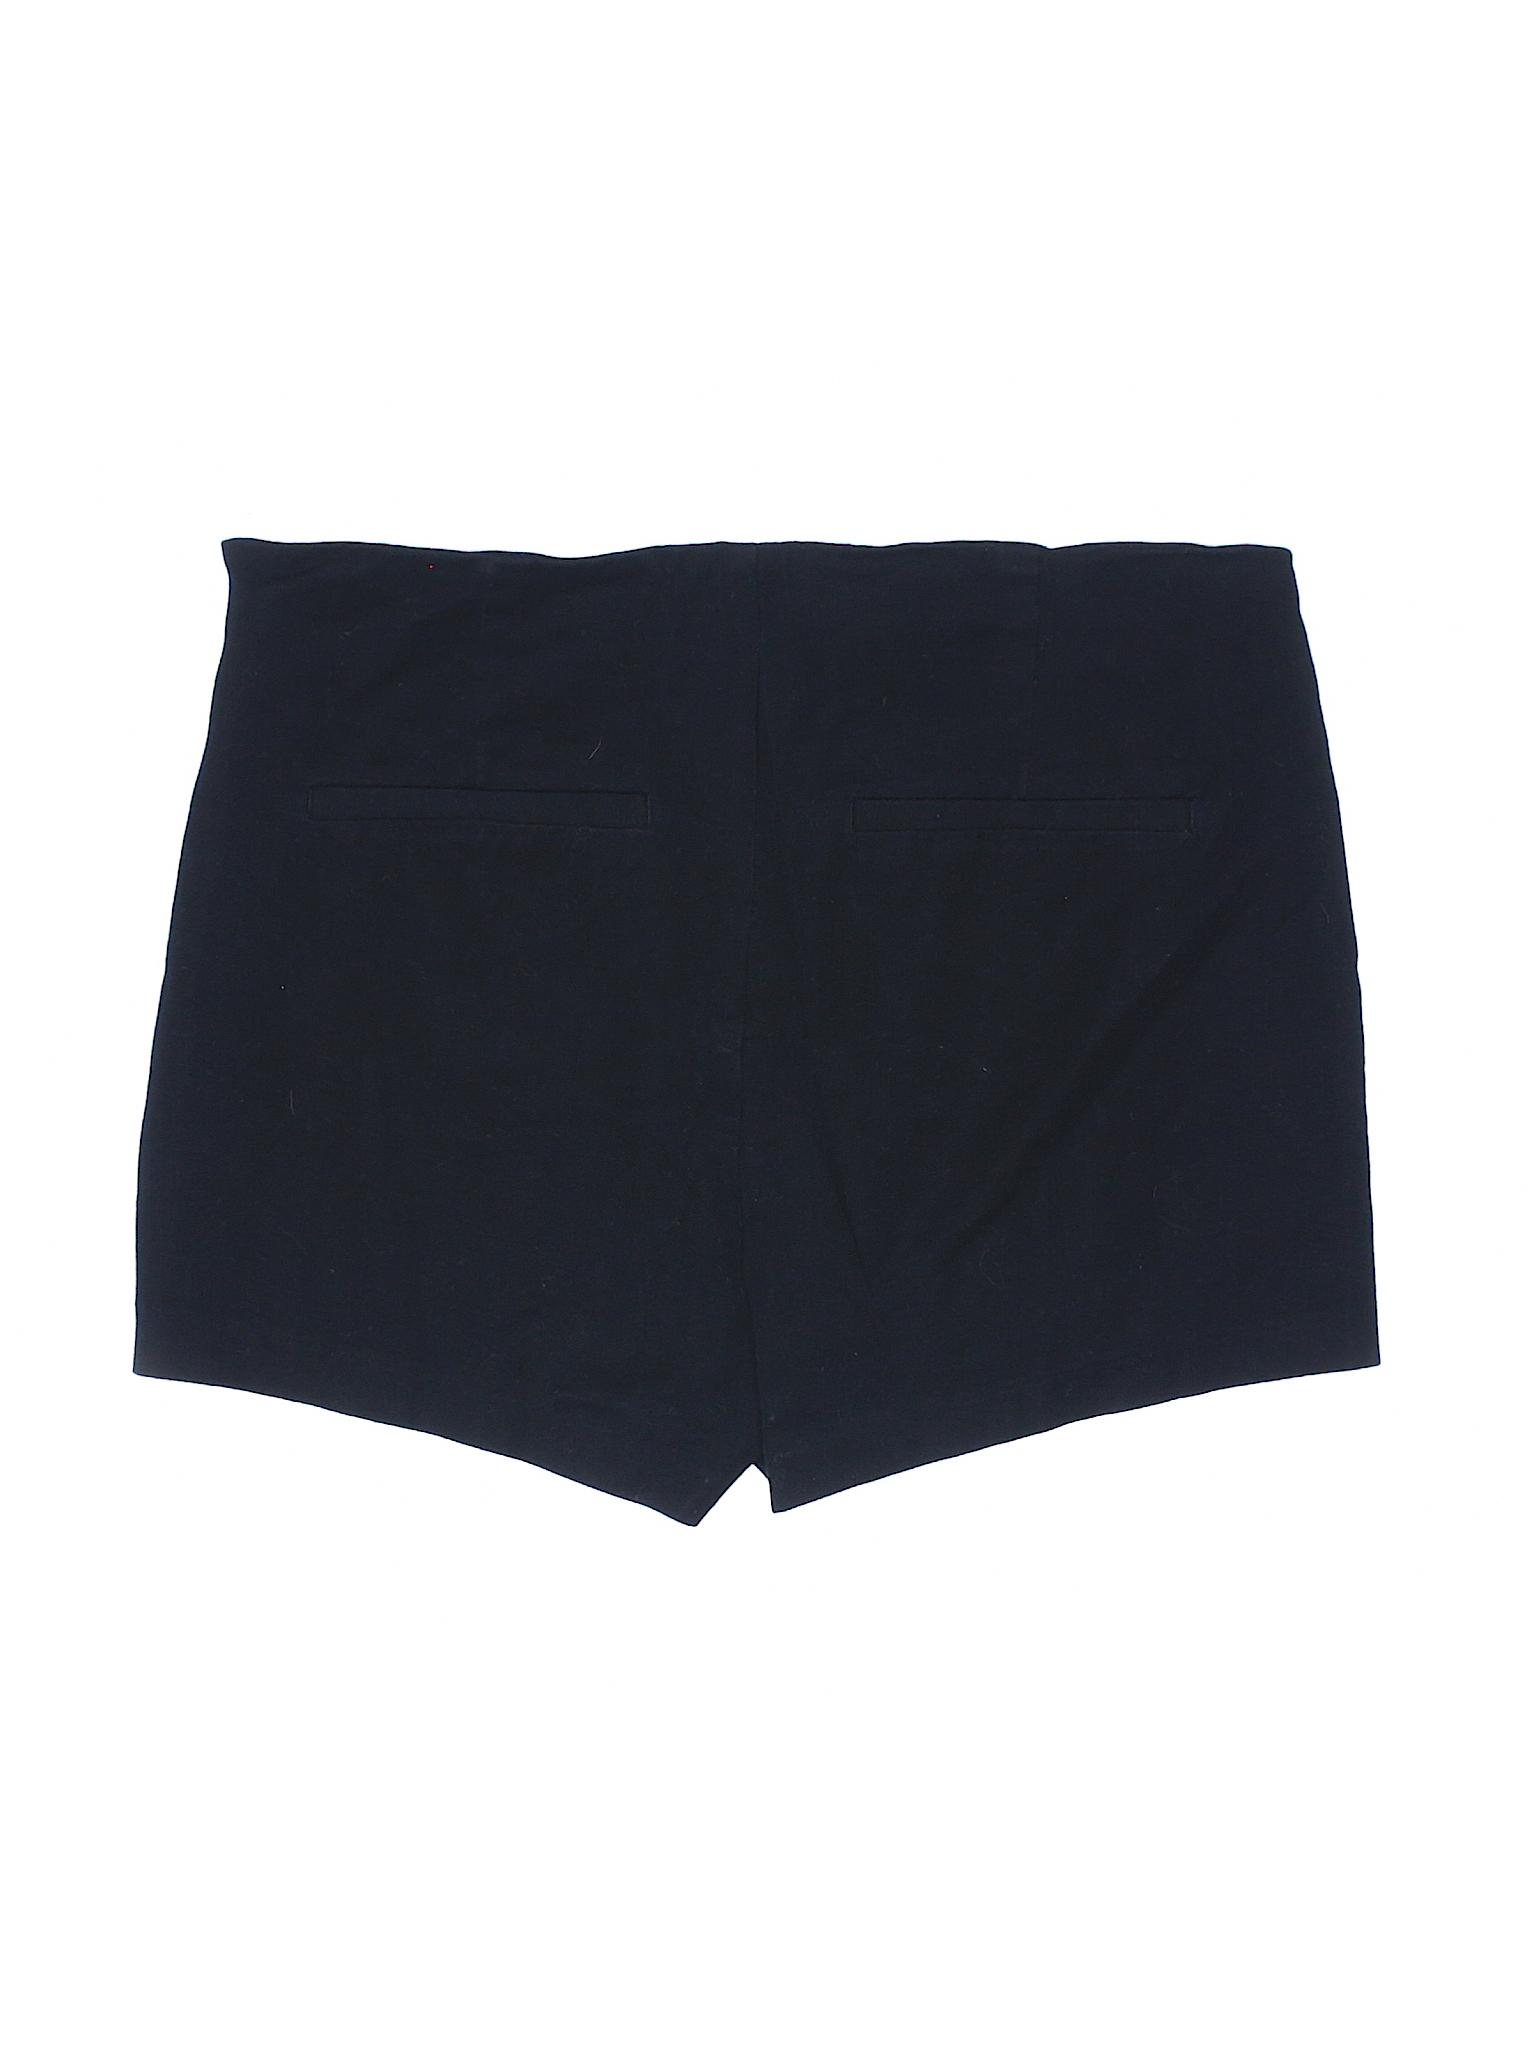 Old Khaki winter Navy Shorts Leisure T0WBq1PwP